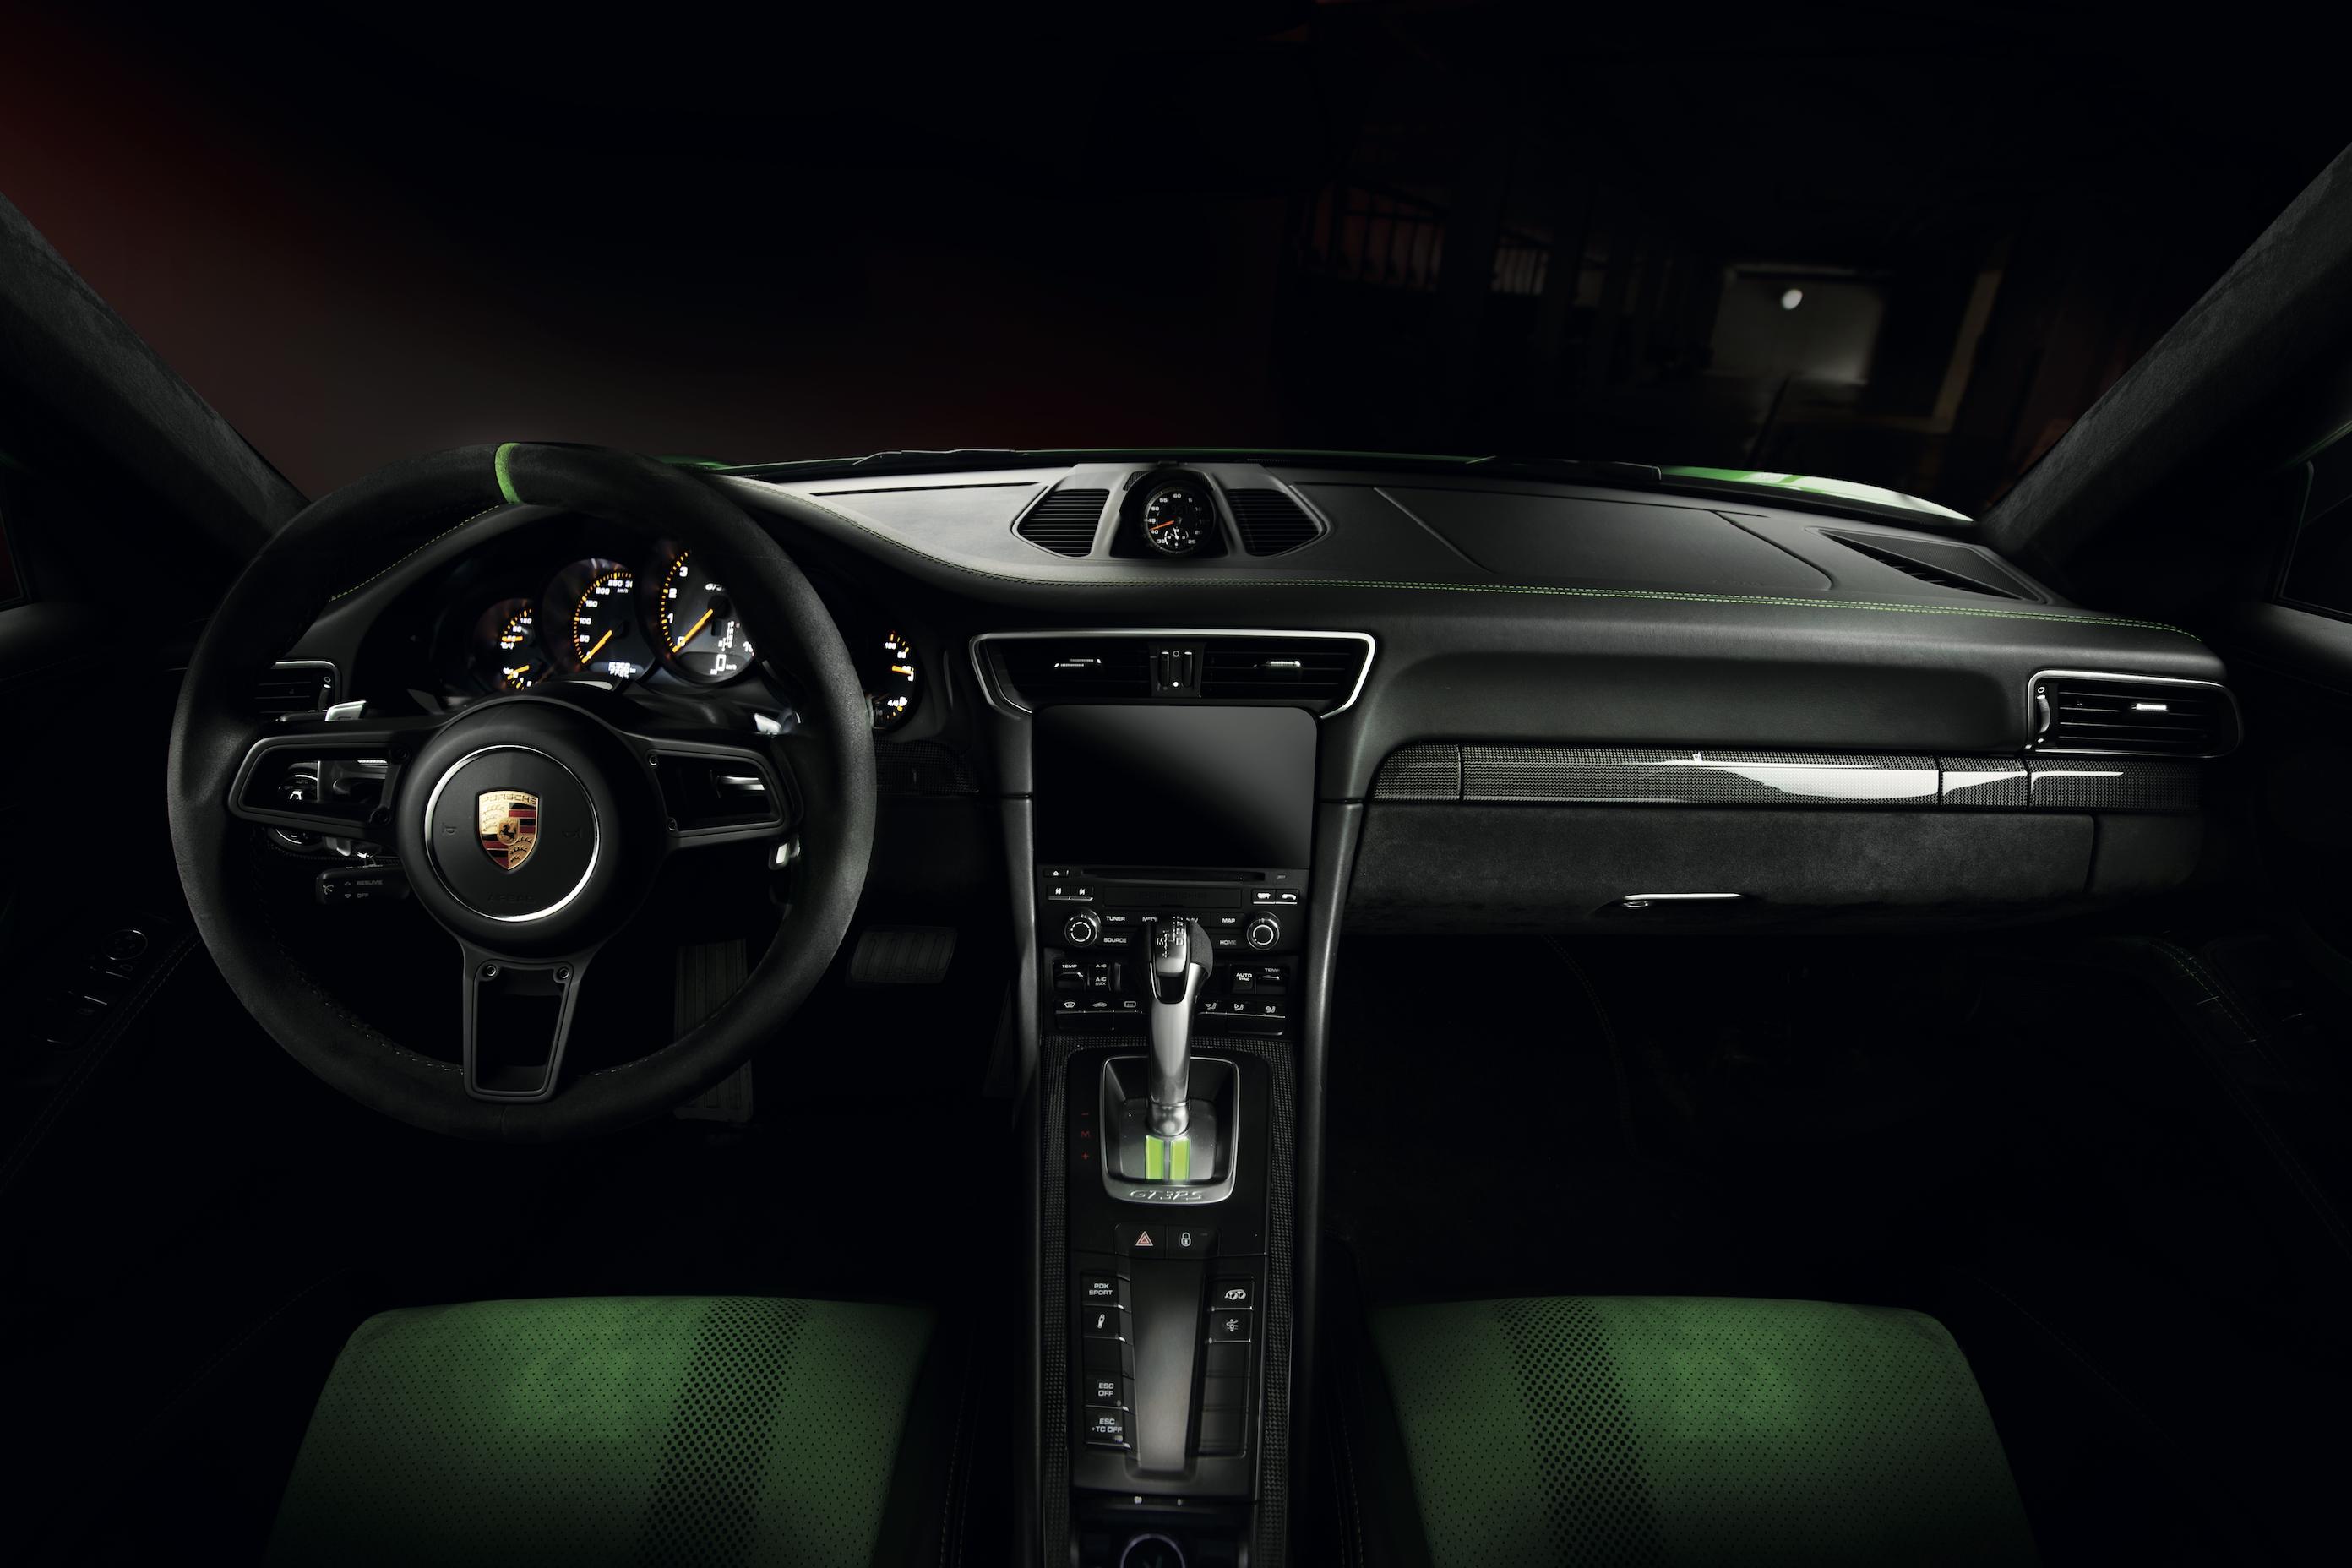 PORSCHE GT3 RS - Project by Unique Media - Ph: Roberto Felicioni - POSH 82